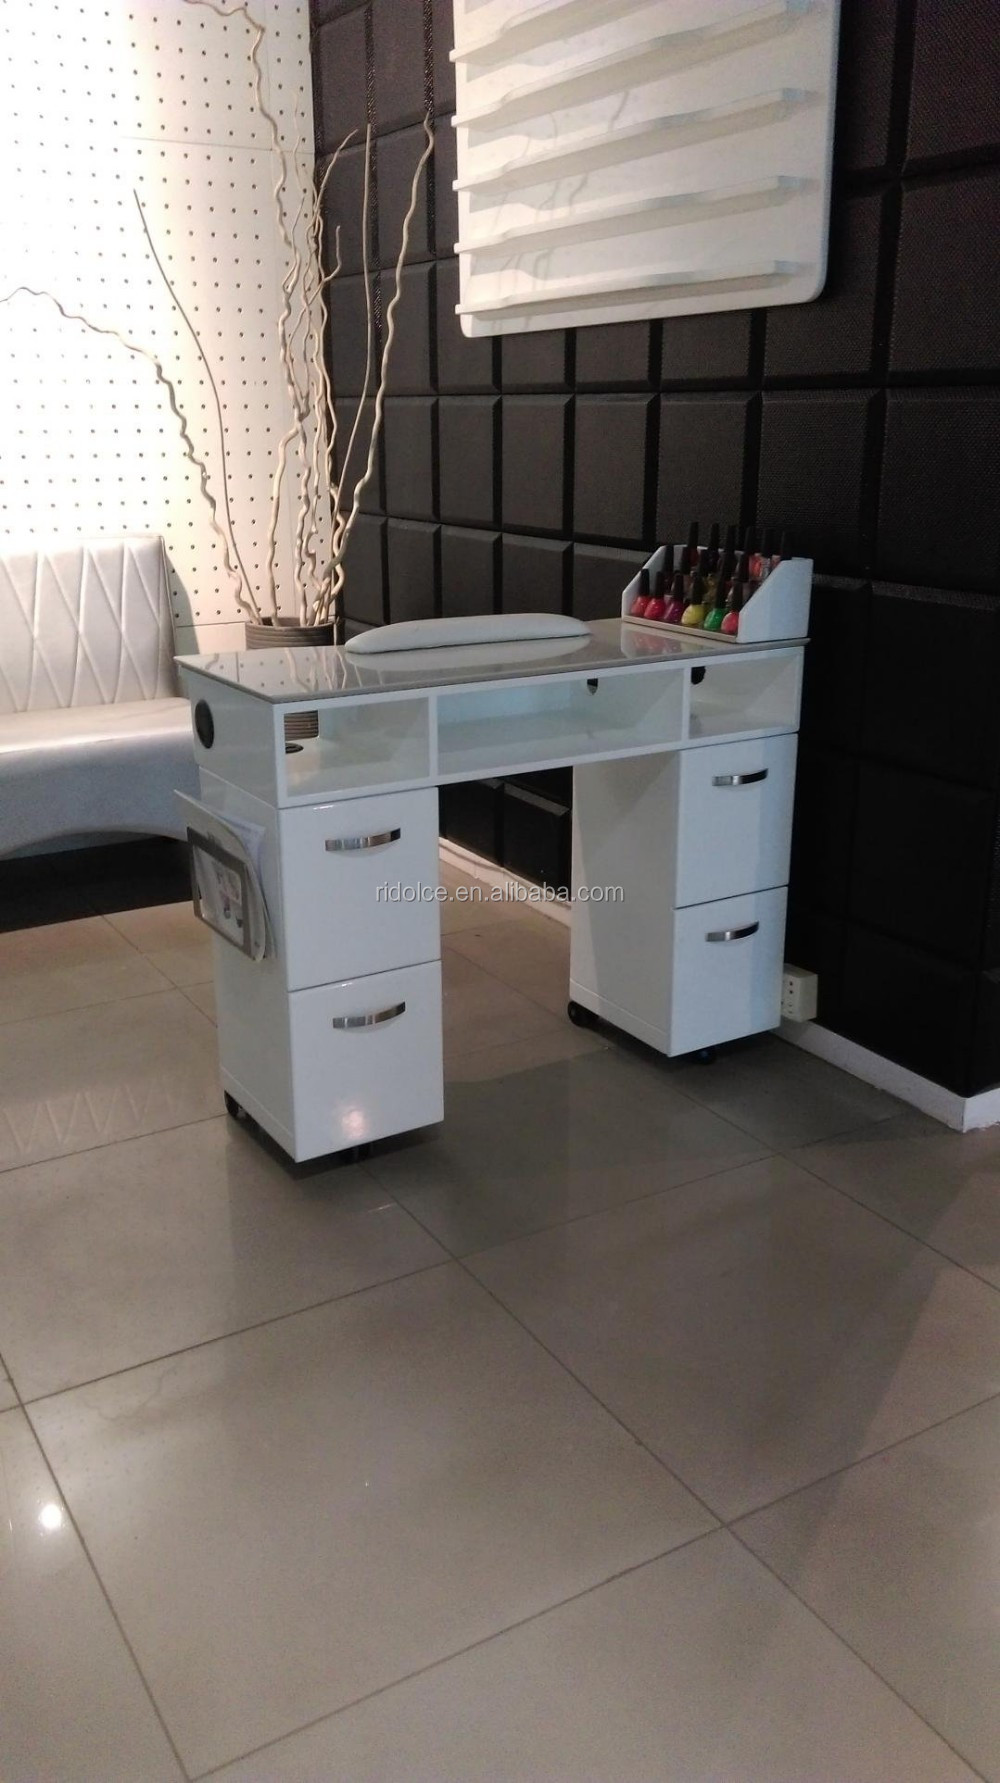 Nail Table Nail Salon Equipment For Sale Salon Furniture Tkn-1ed67 ...